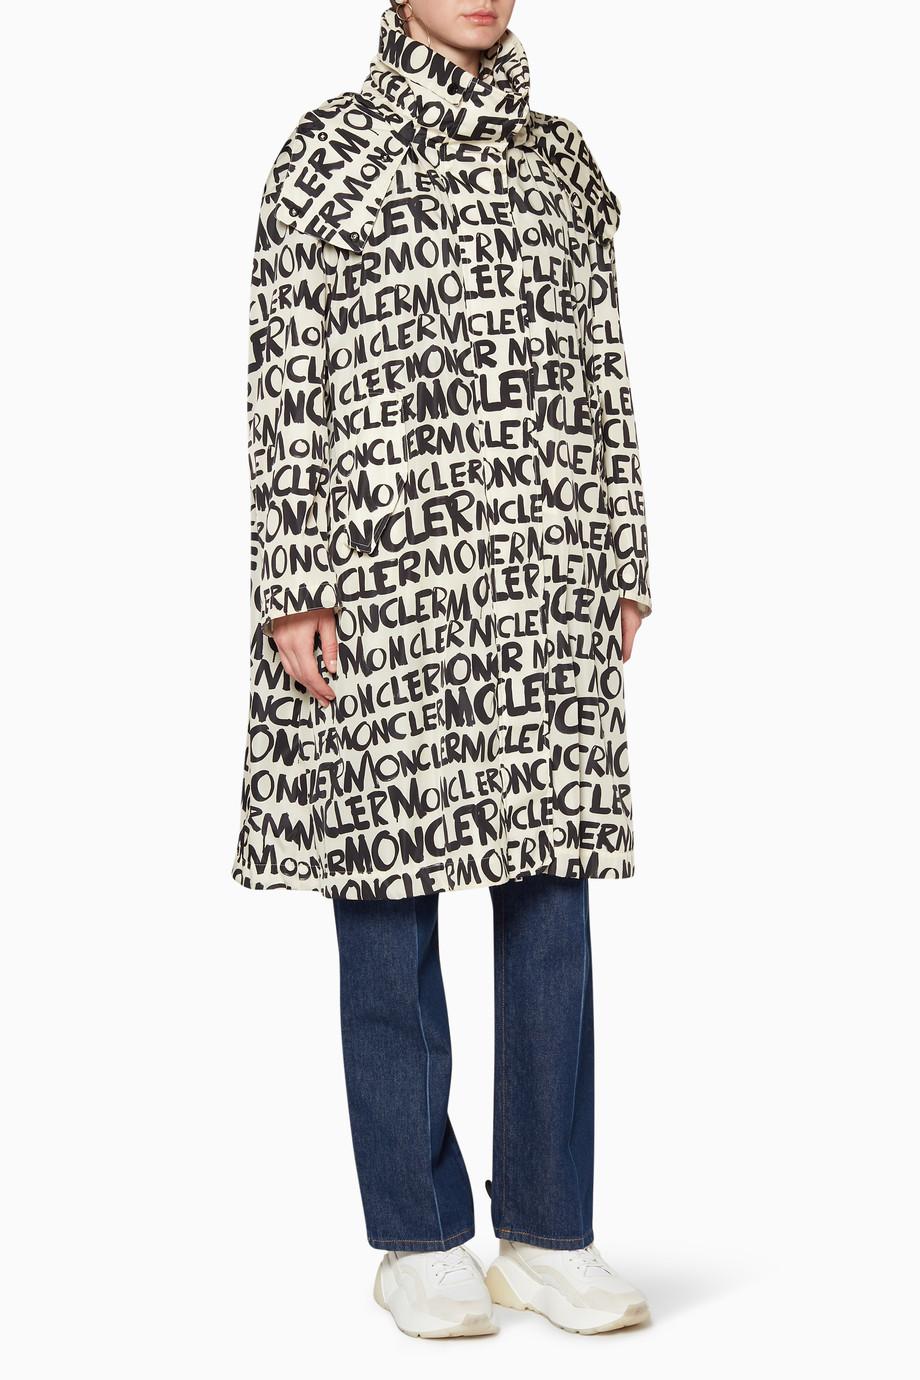 c10b55fb6 Shop Moncler Black Amsterdam Graffiti Jacket for Women | Ounass